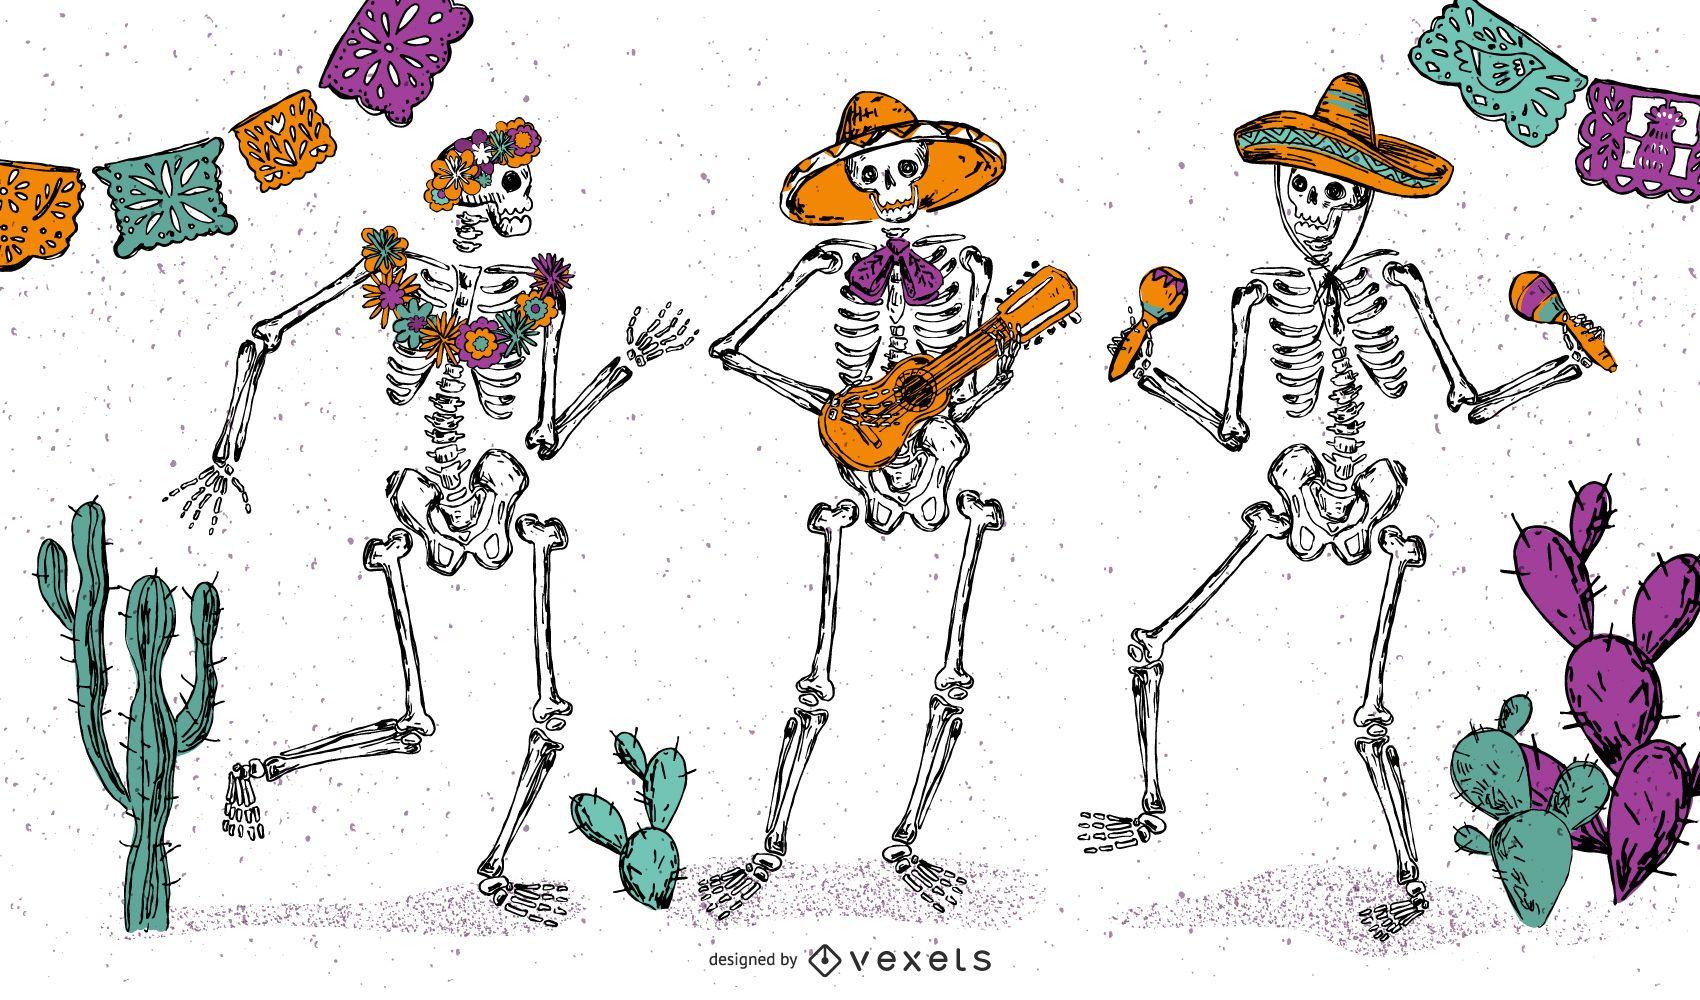 Dise?o de ilustraci?n de esqueleto 5 de Mayo